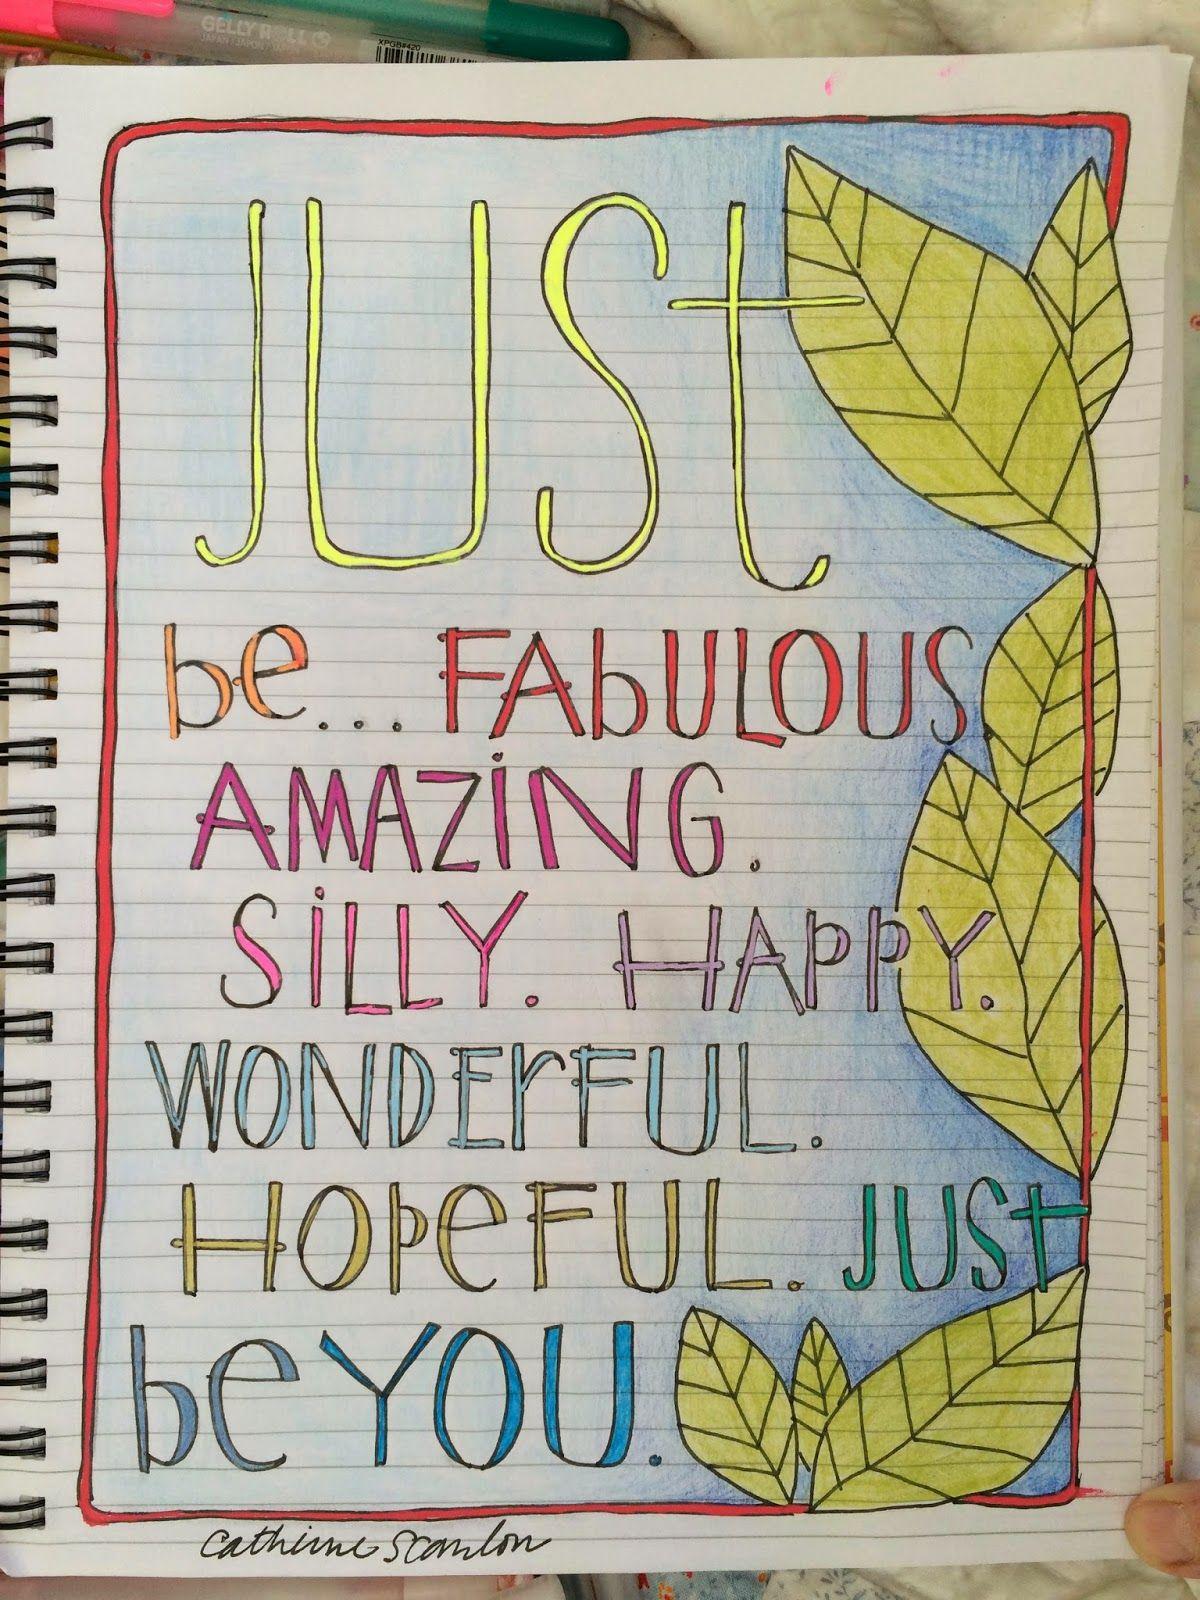 Just be...Fabulous Amazing Silly Happy Wonderful Hopeful...Just be You!